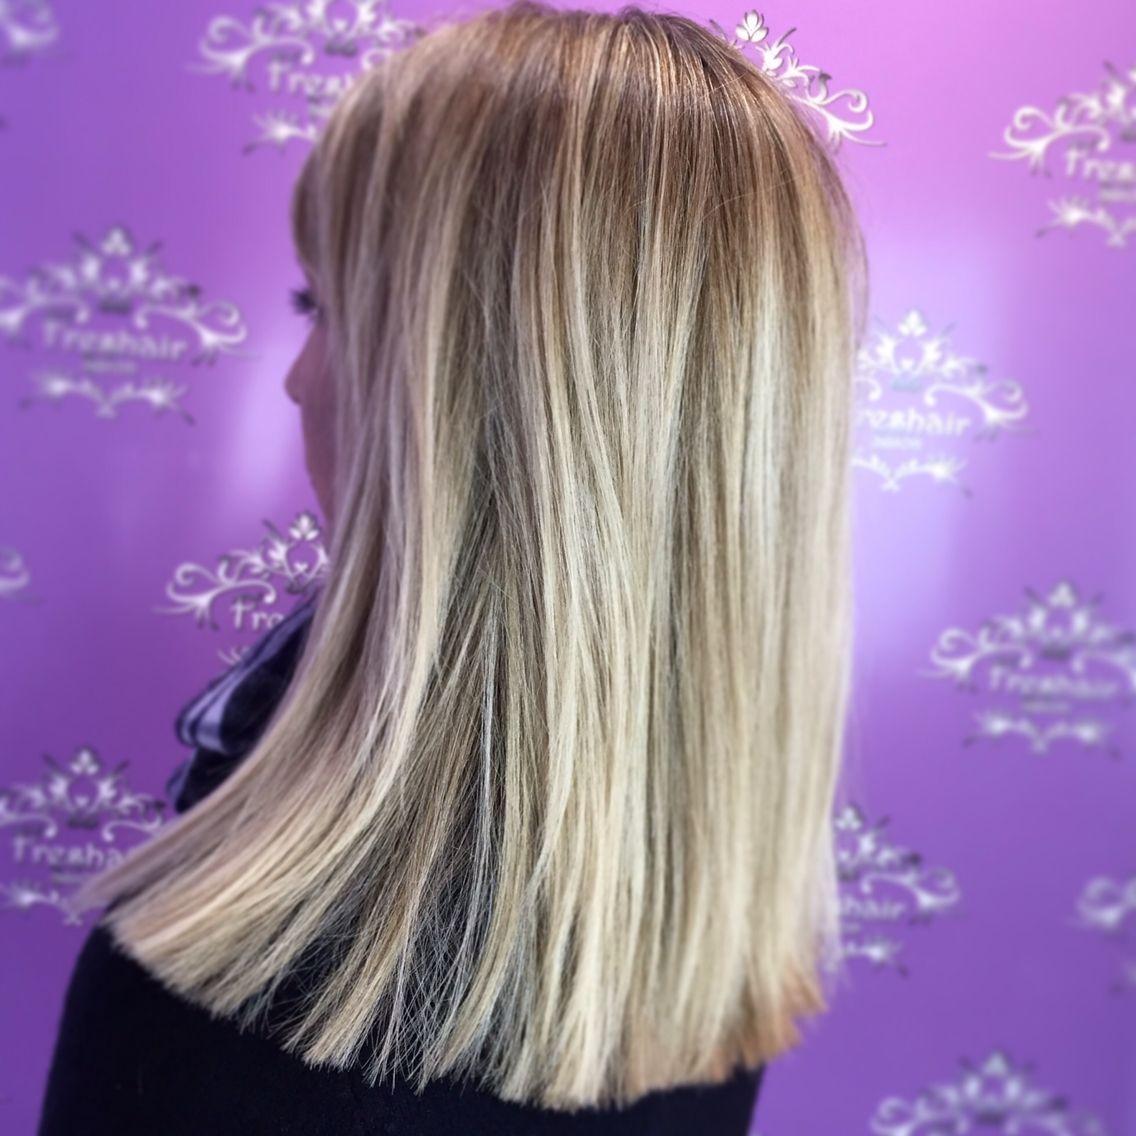 Gorgeous Seamless Blonde By Bek Phelan Freshairsalon Keune